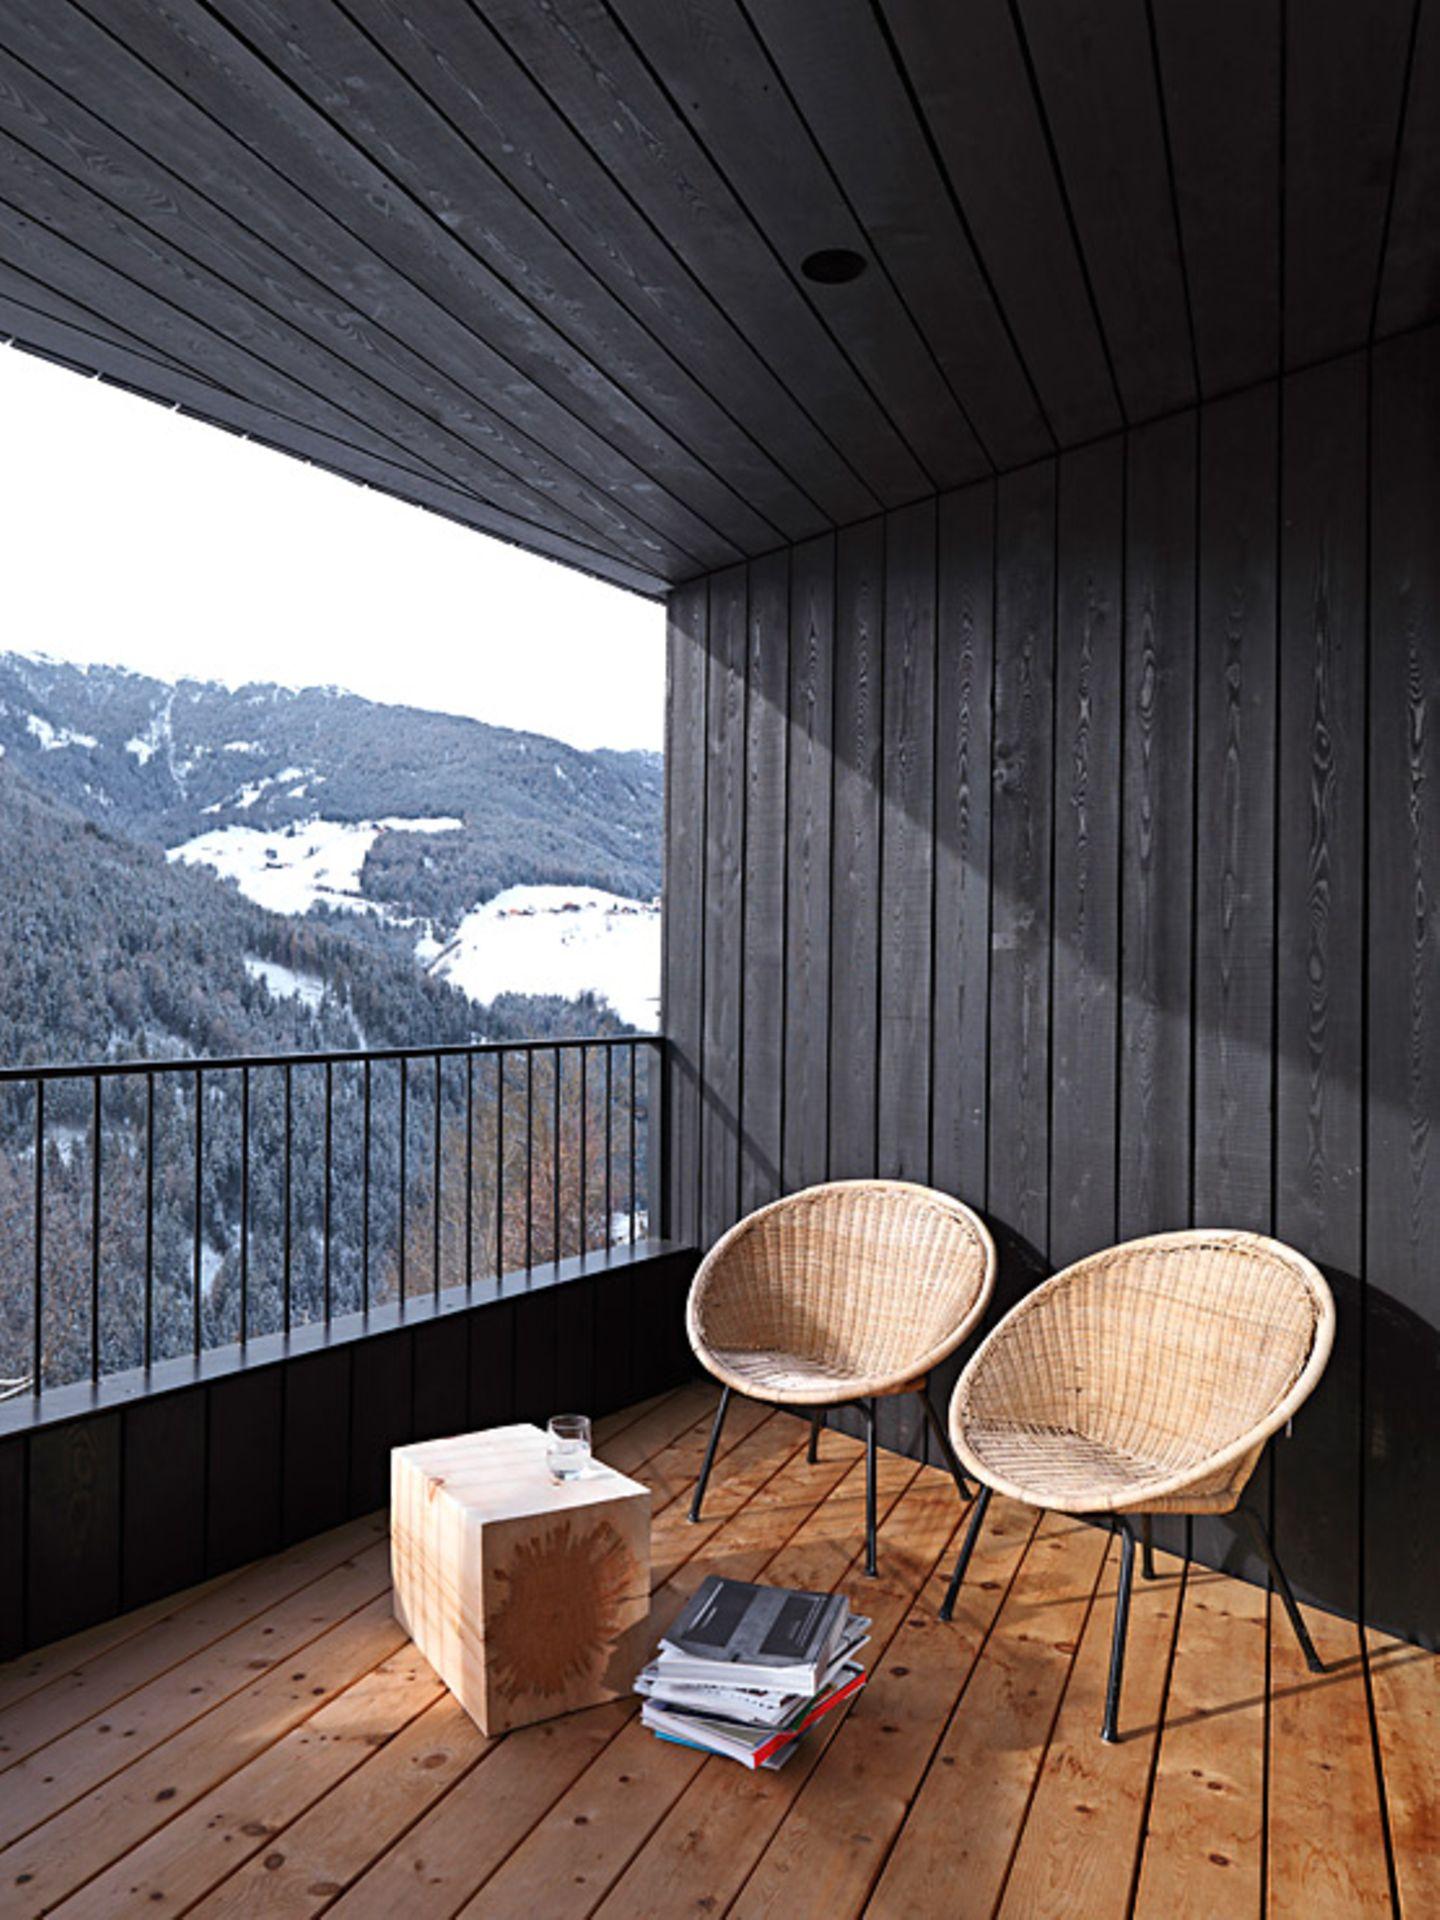 Terrasse aus Lärchenholz